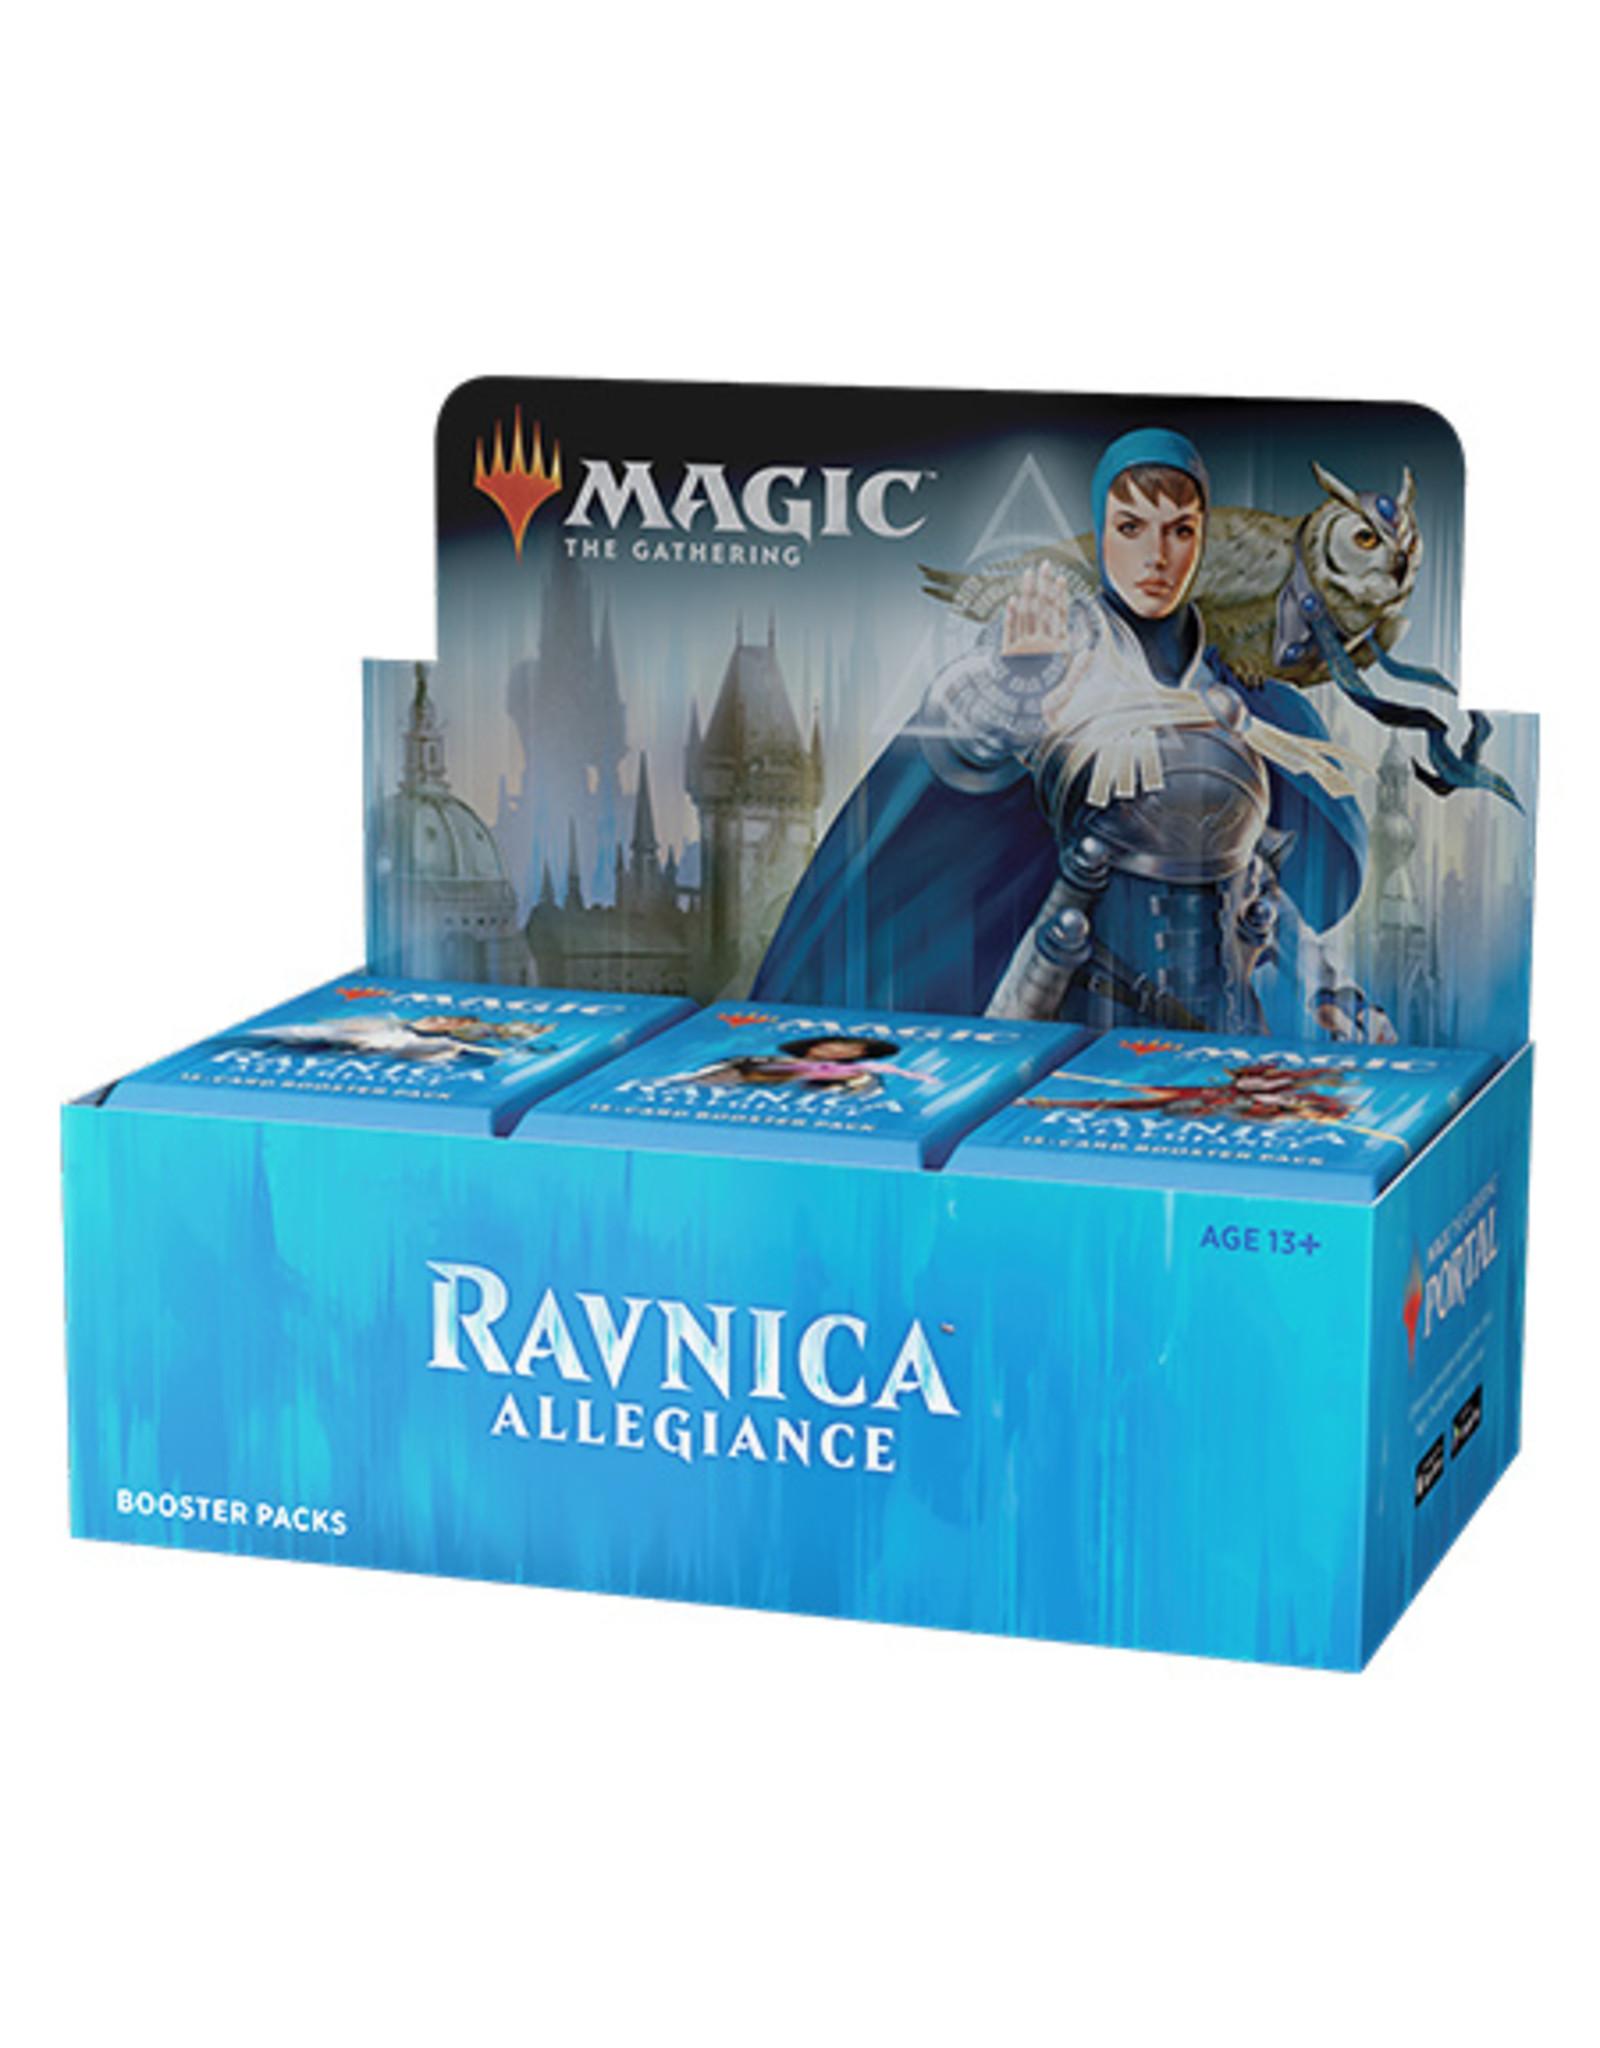 Magic MtG: Ravnica Allegiance Booster Box